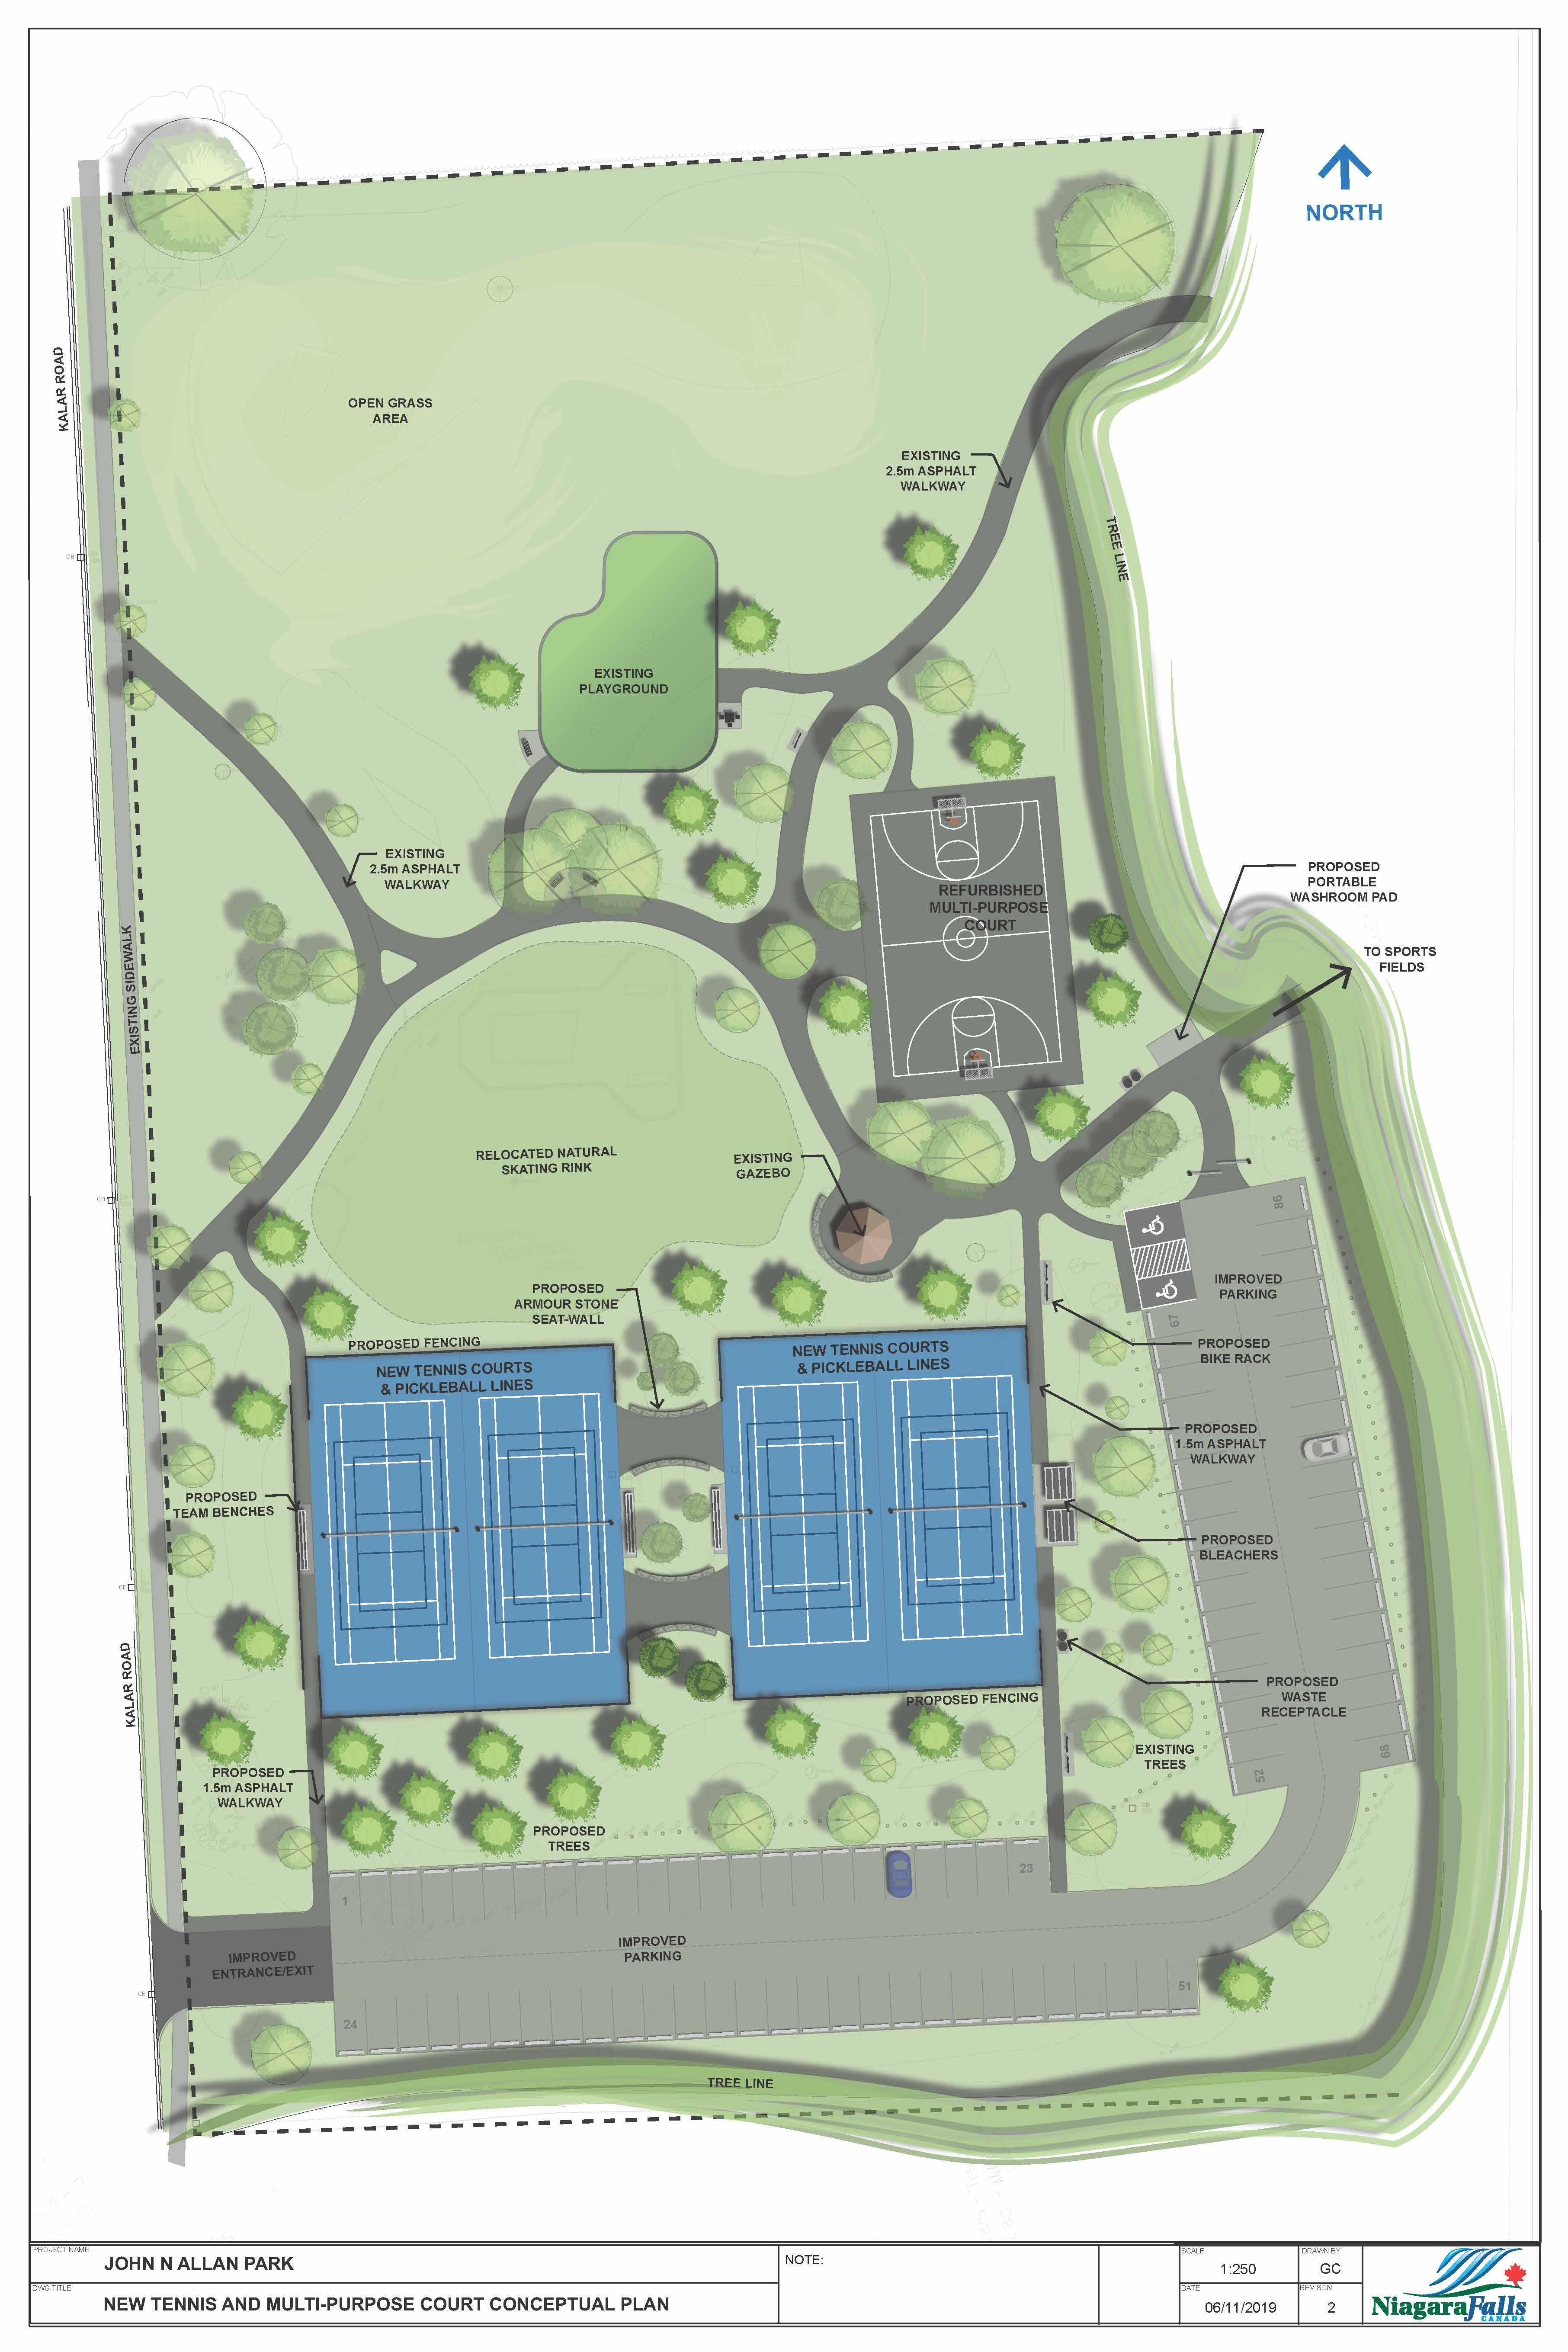 New tennis and multi-purpose court conceptual plan of John N Allan park.